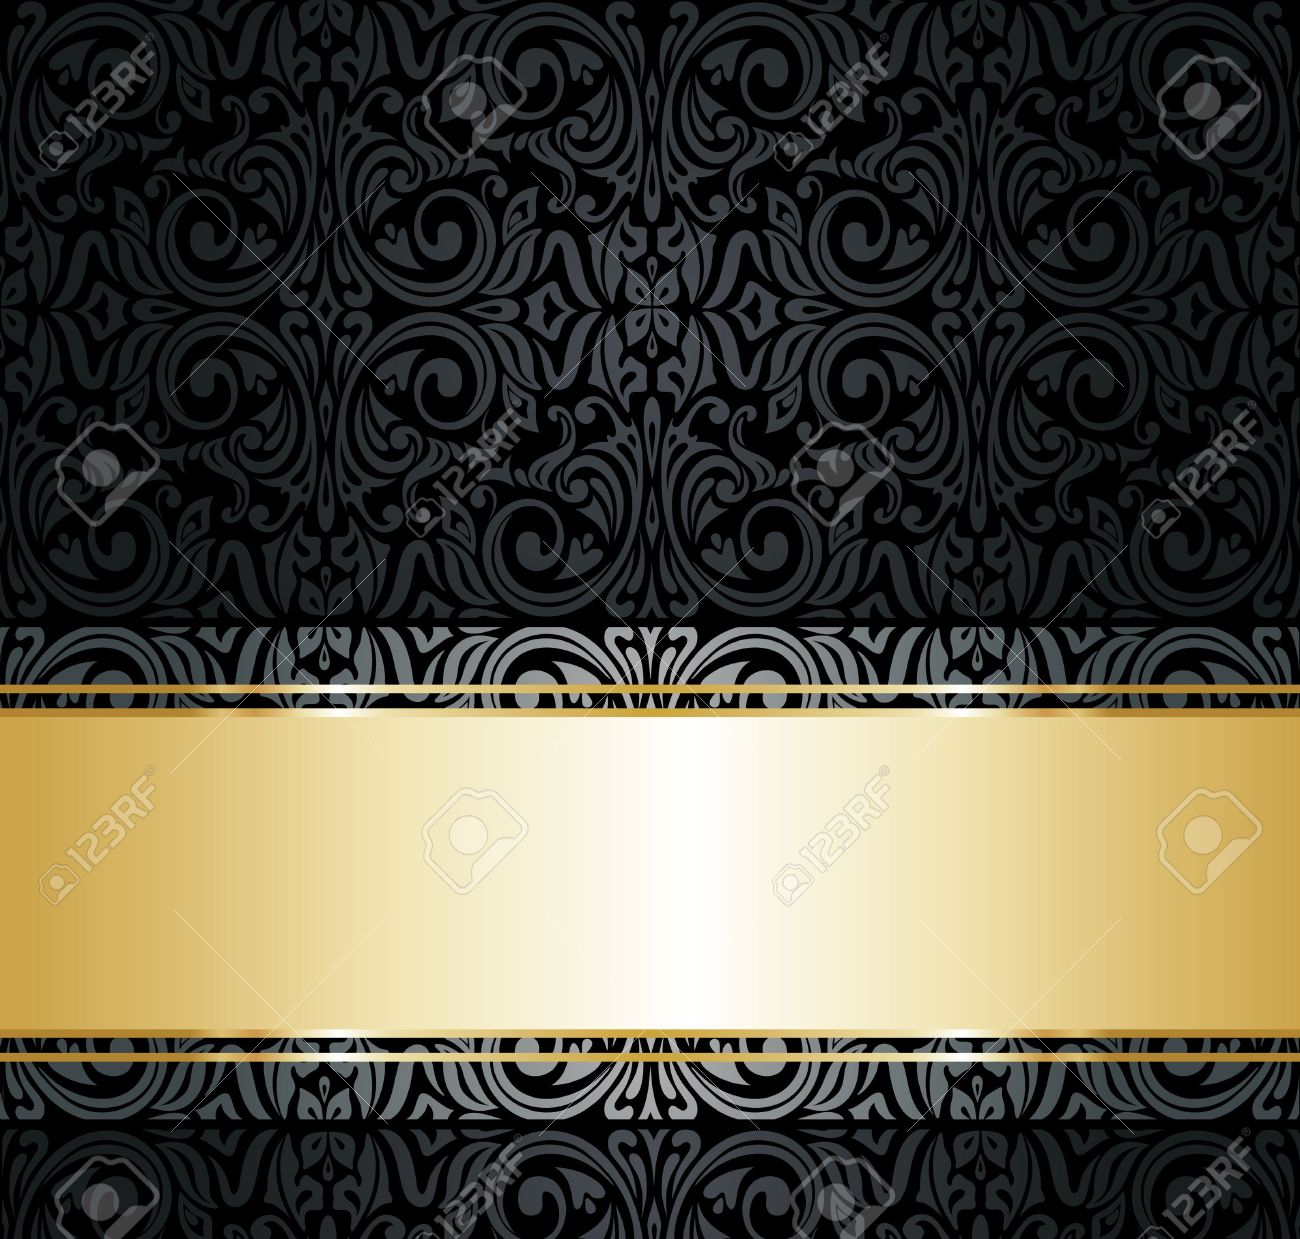 Black And Gold Vintage Wallpaper WallpaperHDCcom 1300x1239